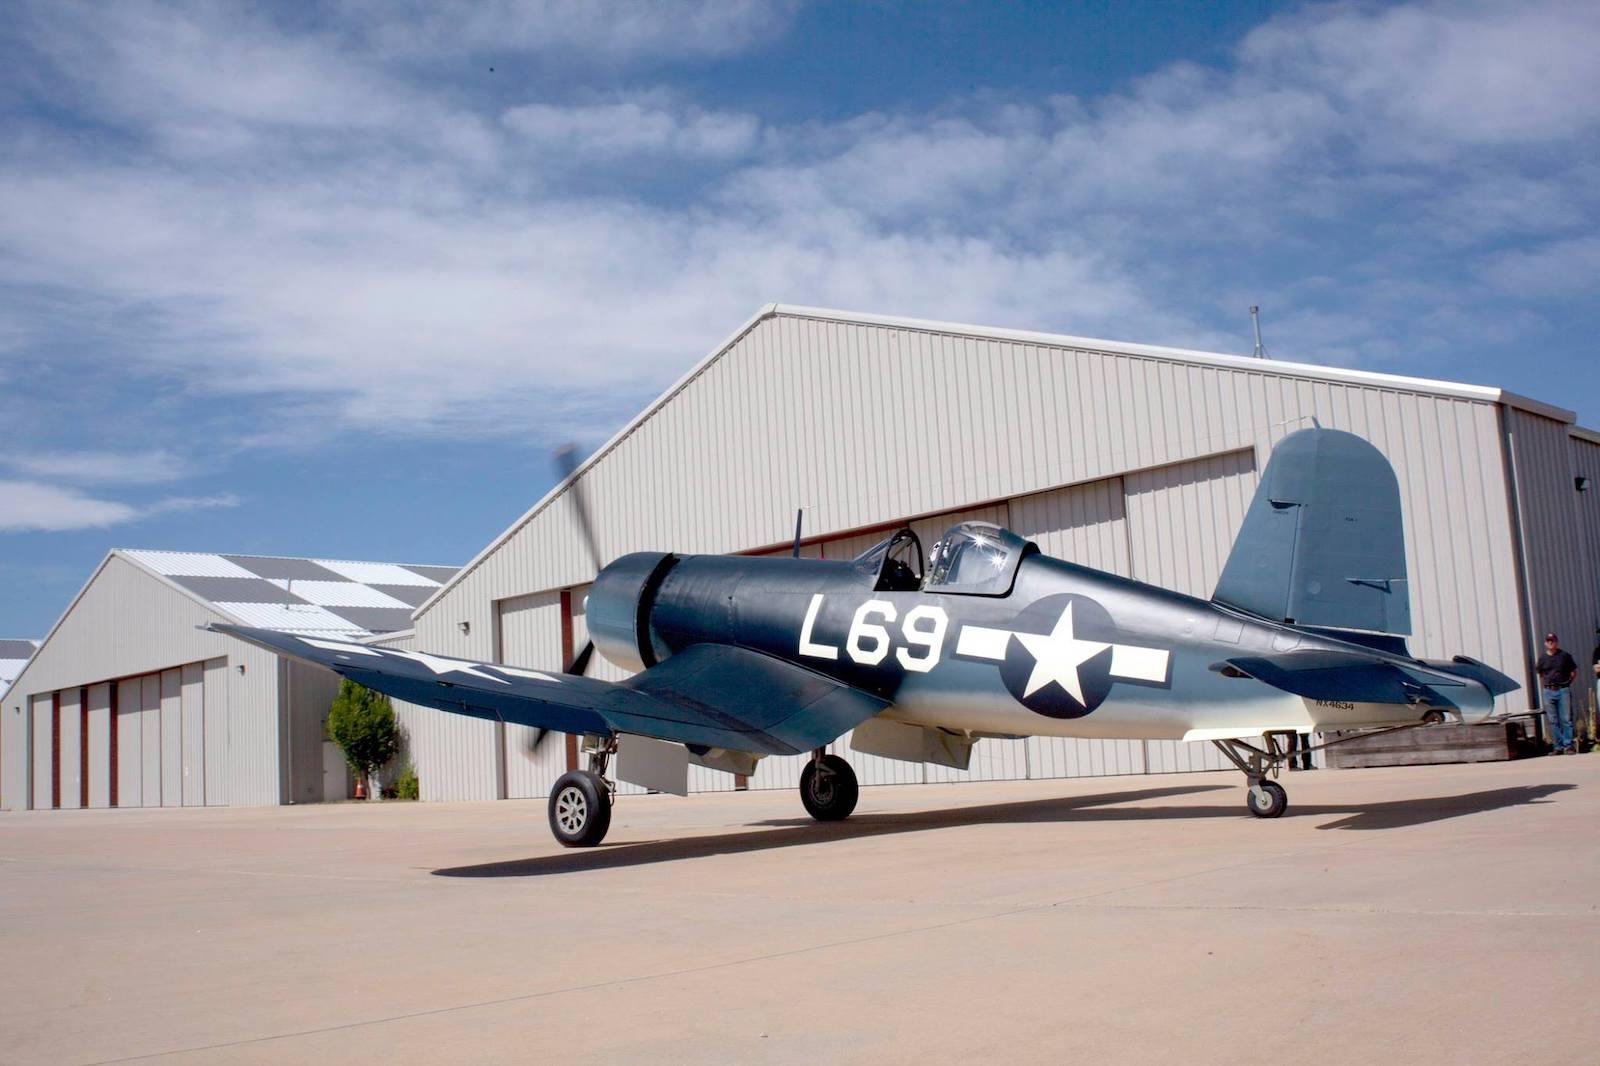 National Museum of World War 2 Aviation, CO